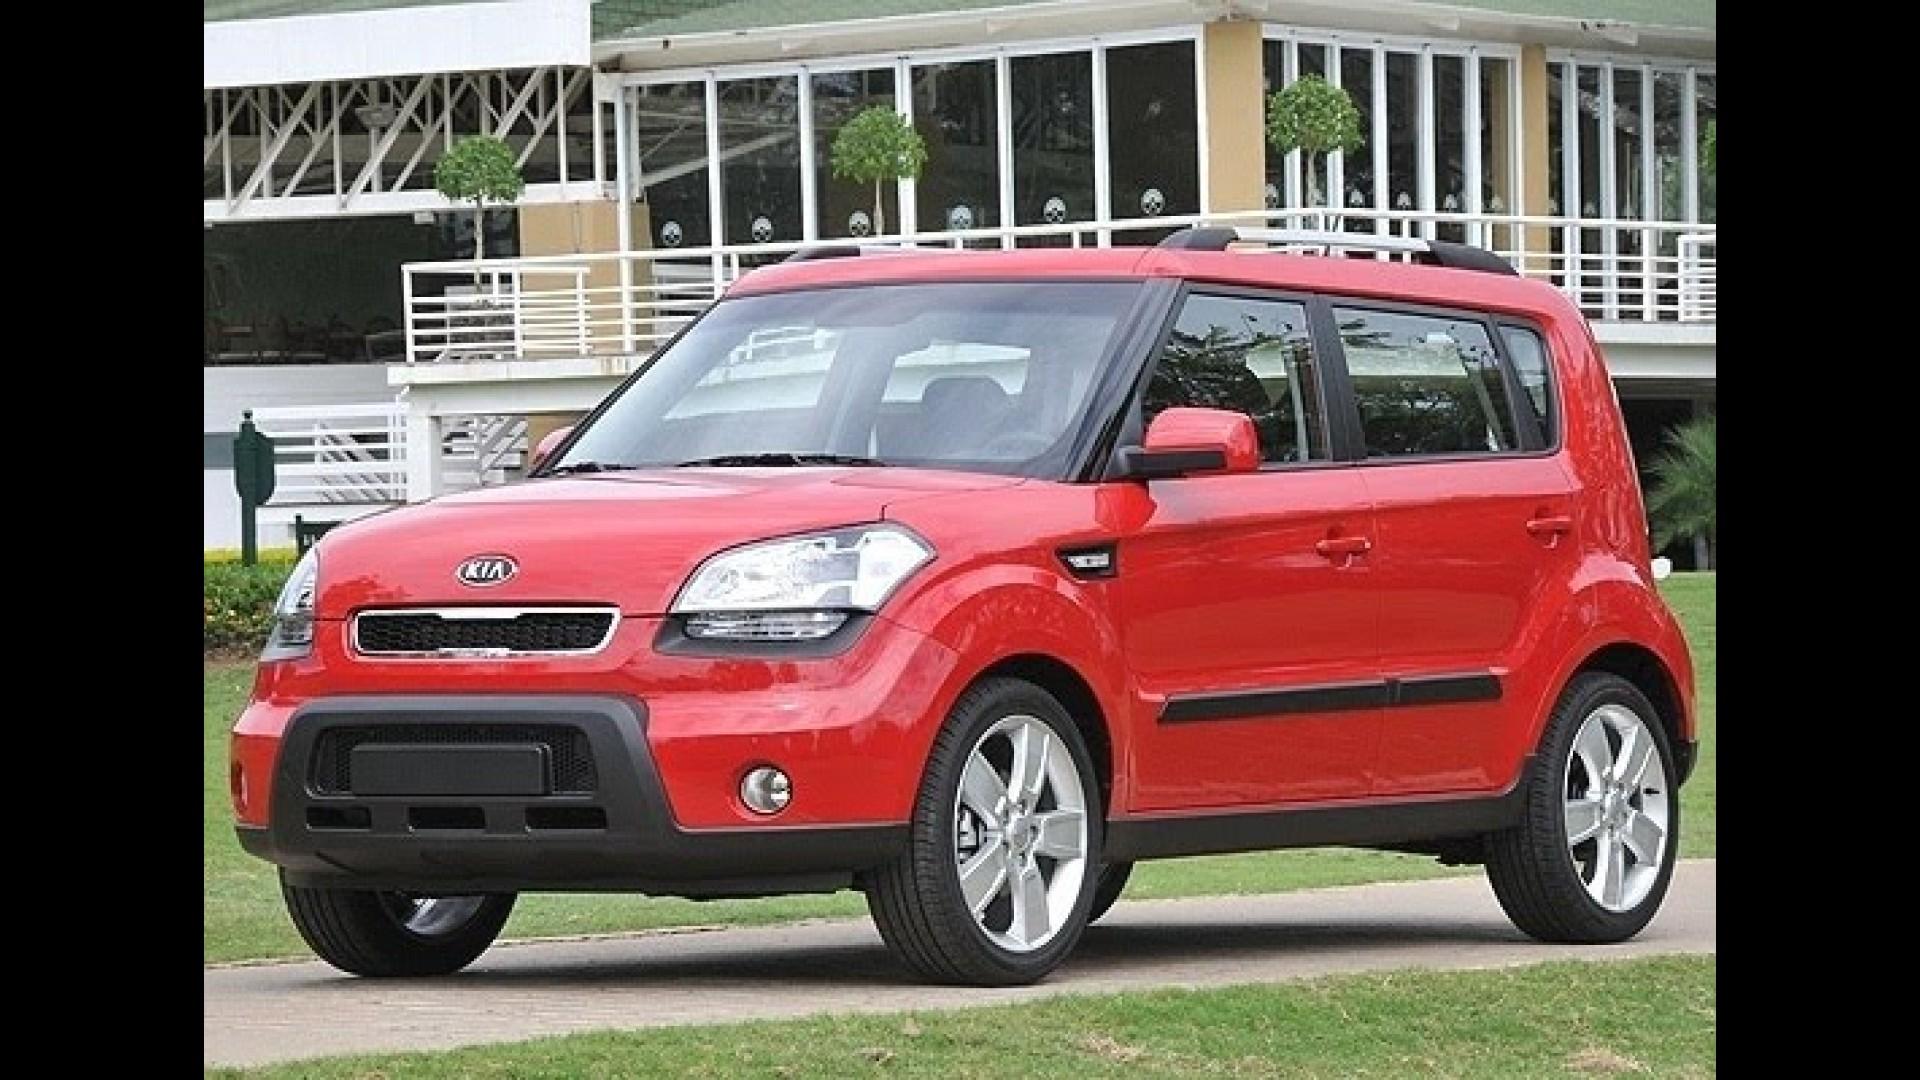 Kia Chama 24191 Carros No Brasil Para Recall Motors Recalls